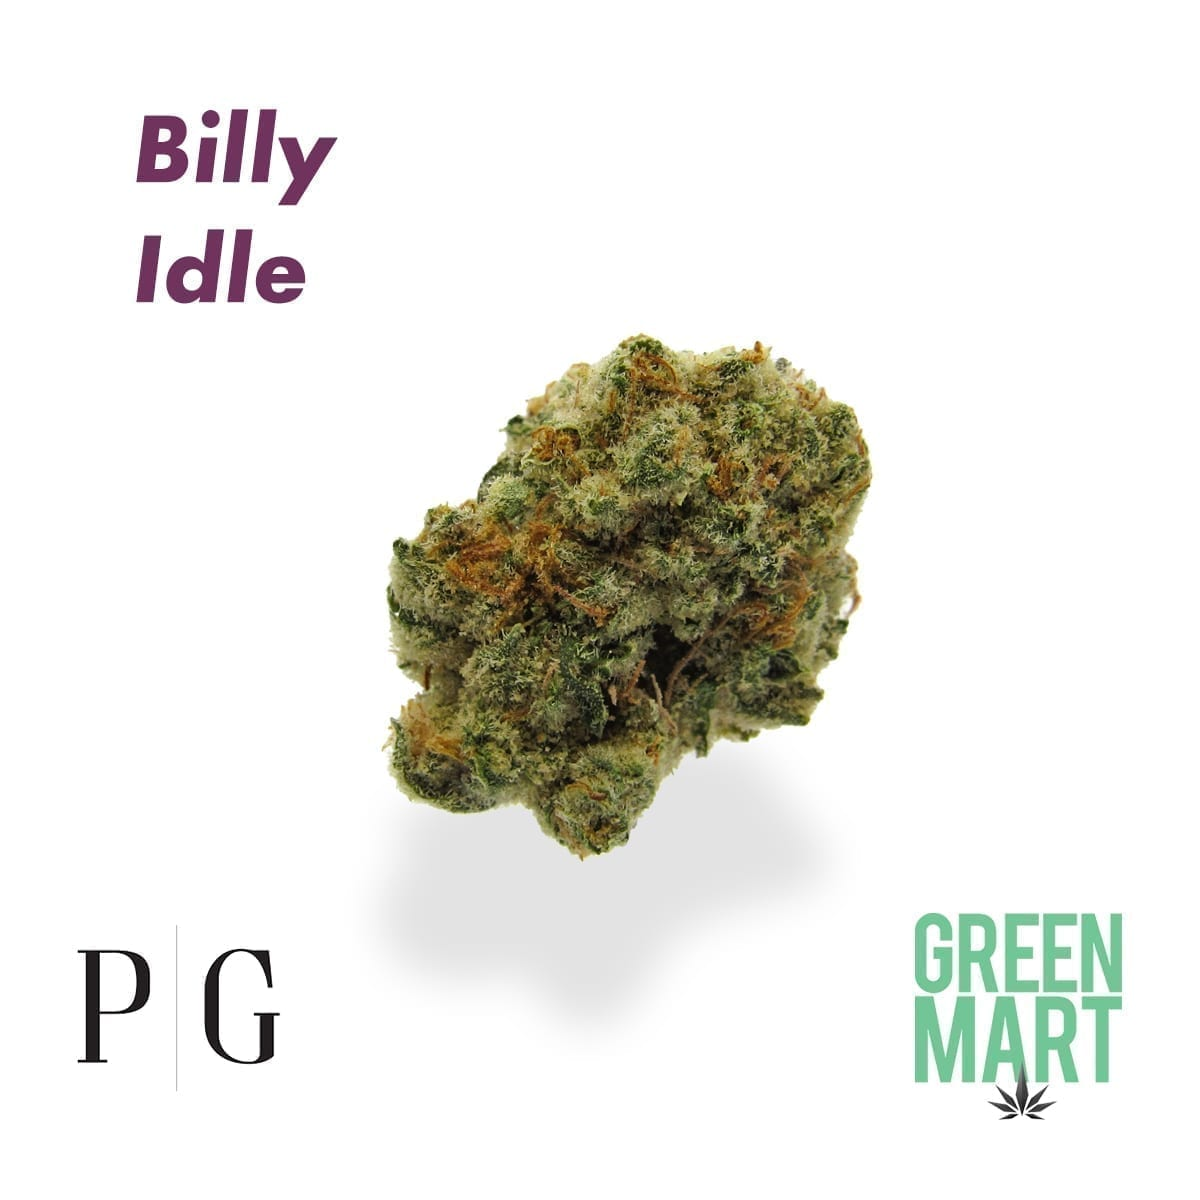 Billy Idle